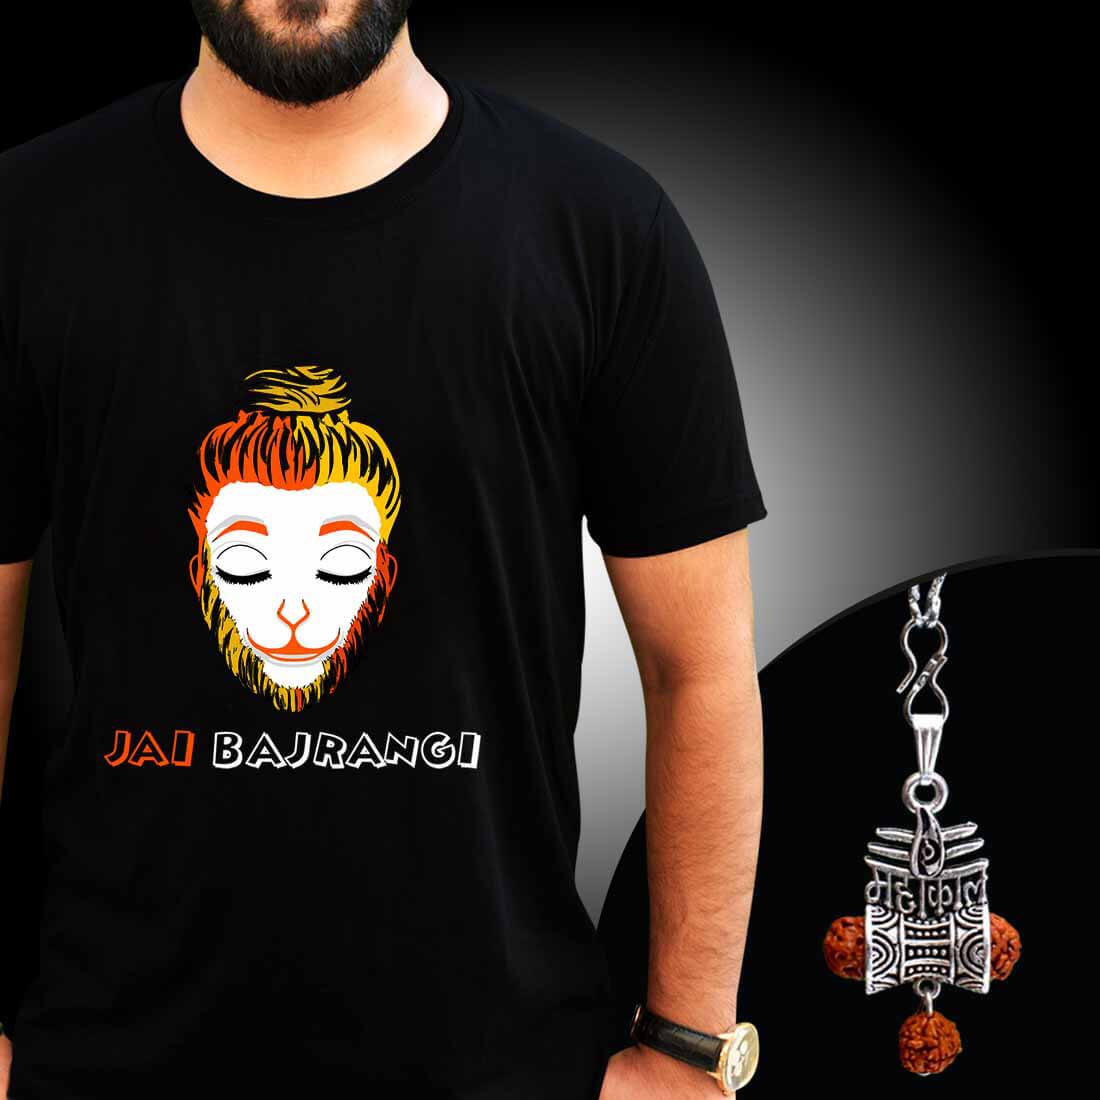 Jai Bajrangi Printed T Shirt Combo With Mahakal Locket